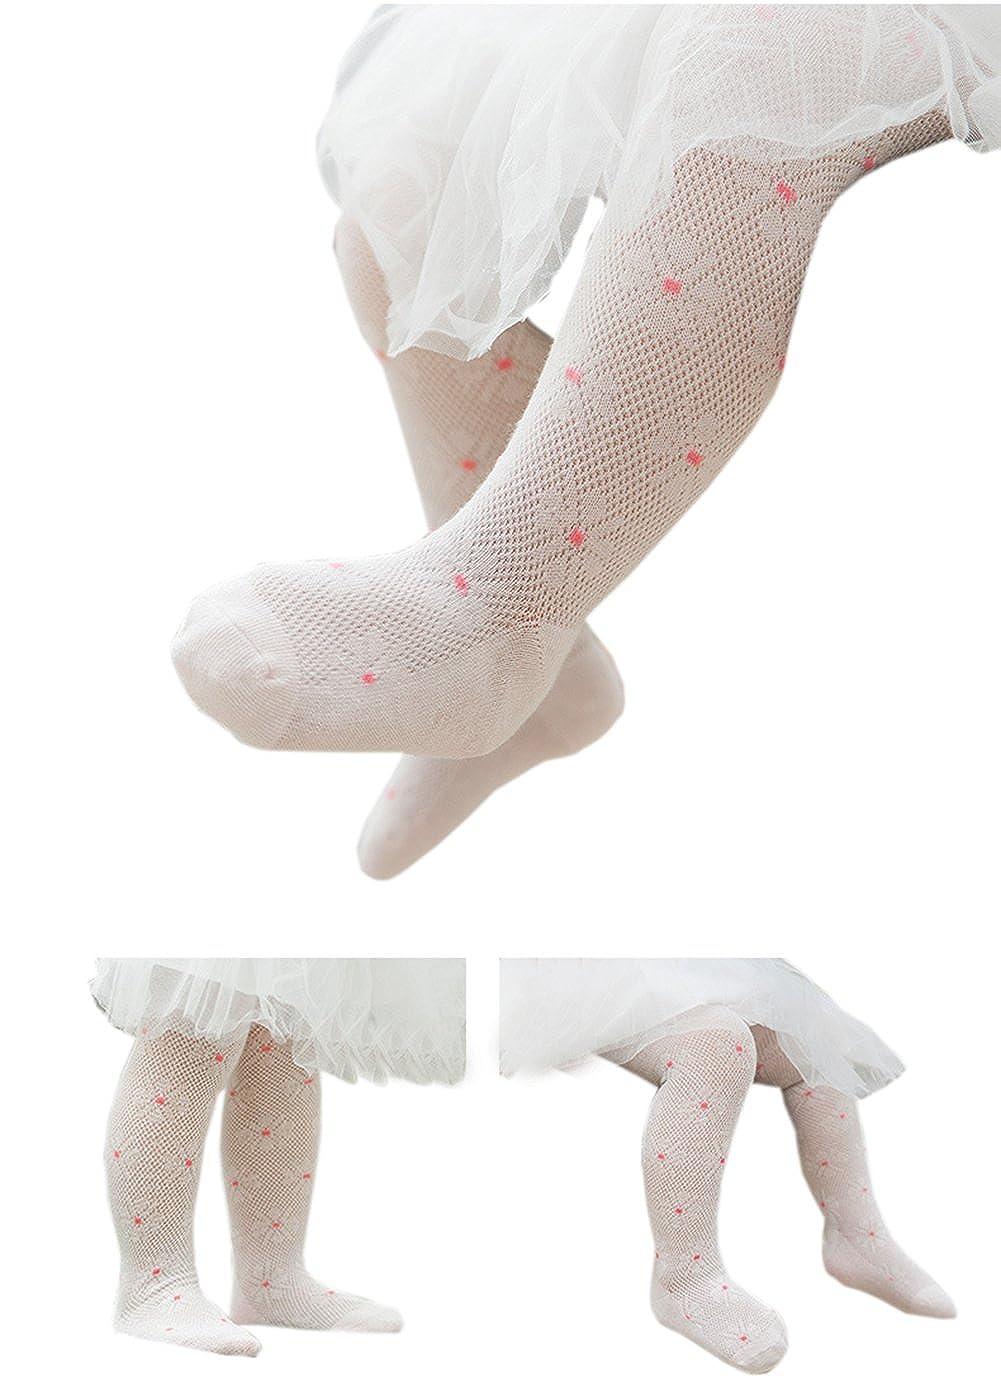 Taiycyxgan Baby Girls Cotton Tights Infant Mesh Net Flowers Leggings Stocking 4-Pack